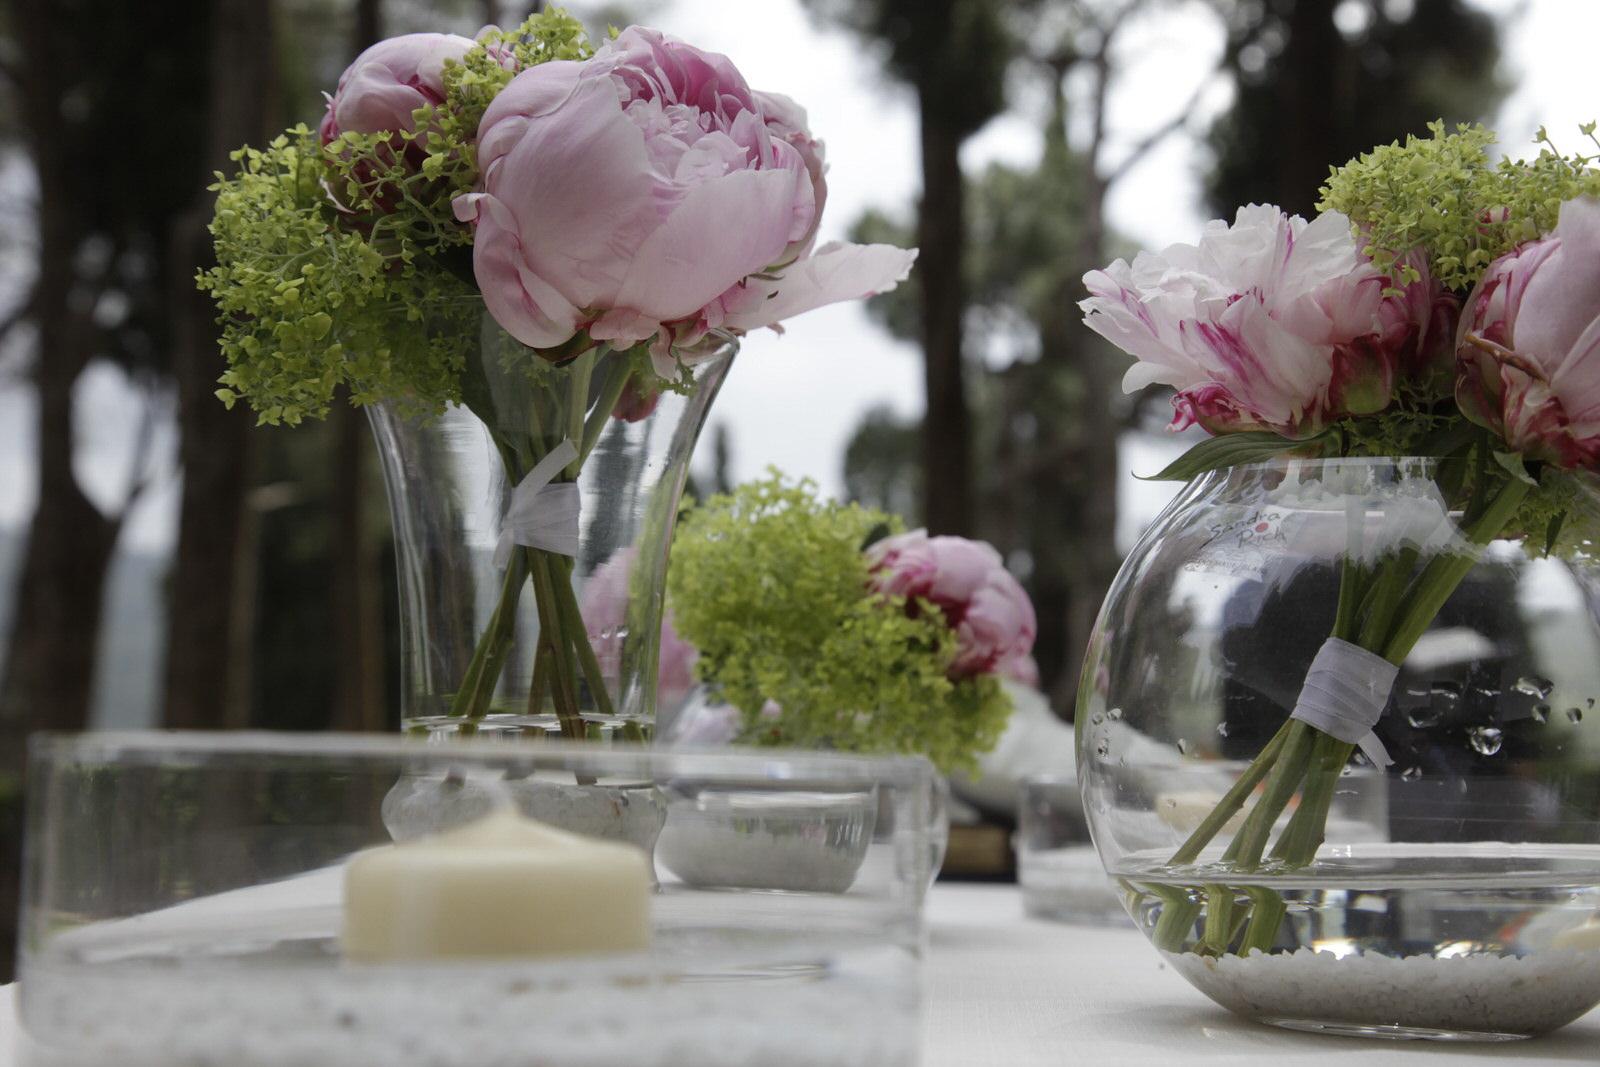 tuscany-wedding-planners-floristen-44.JPG